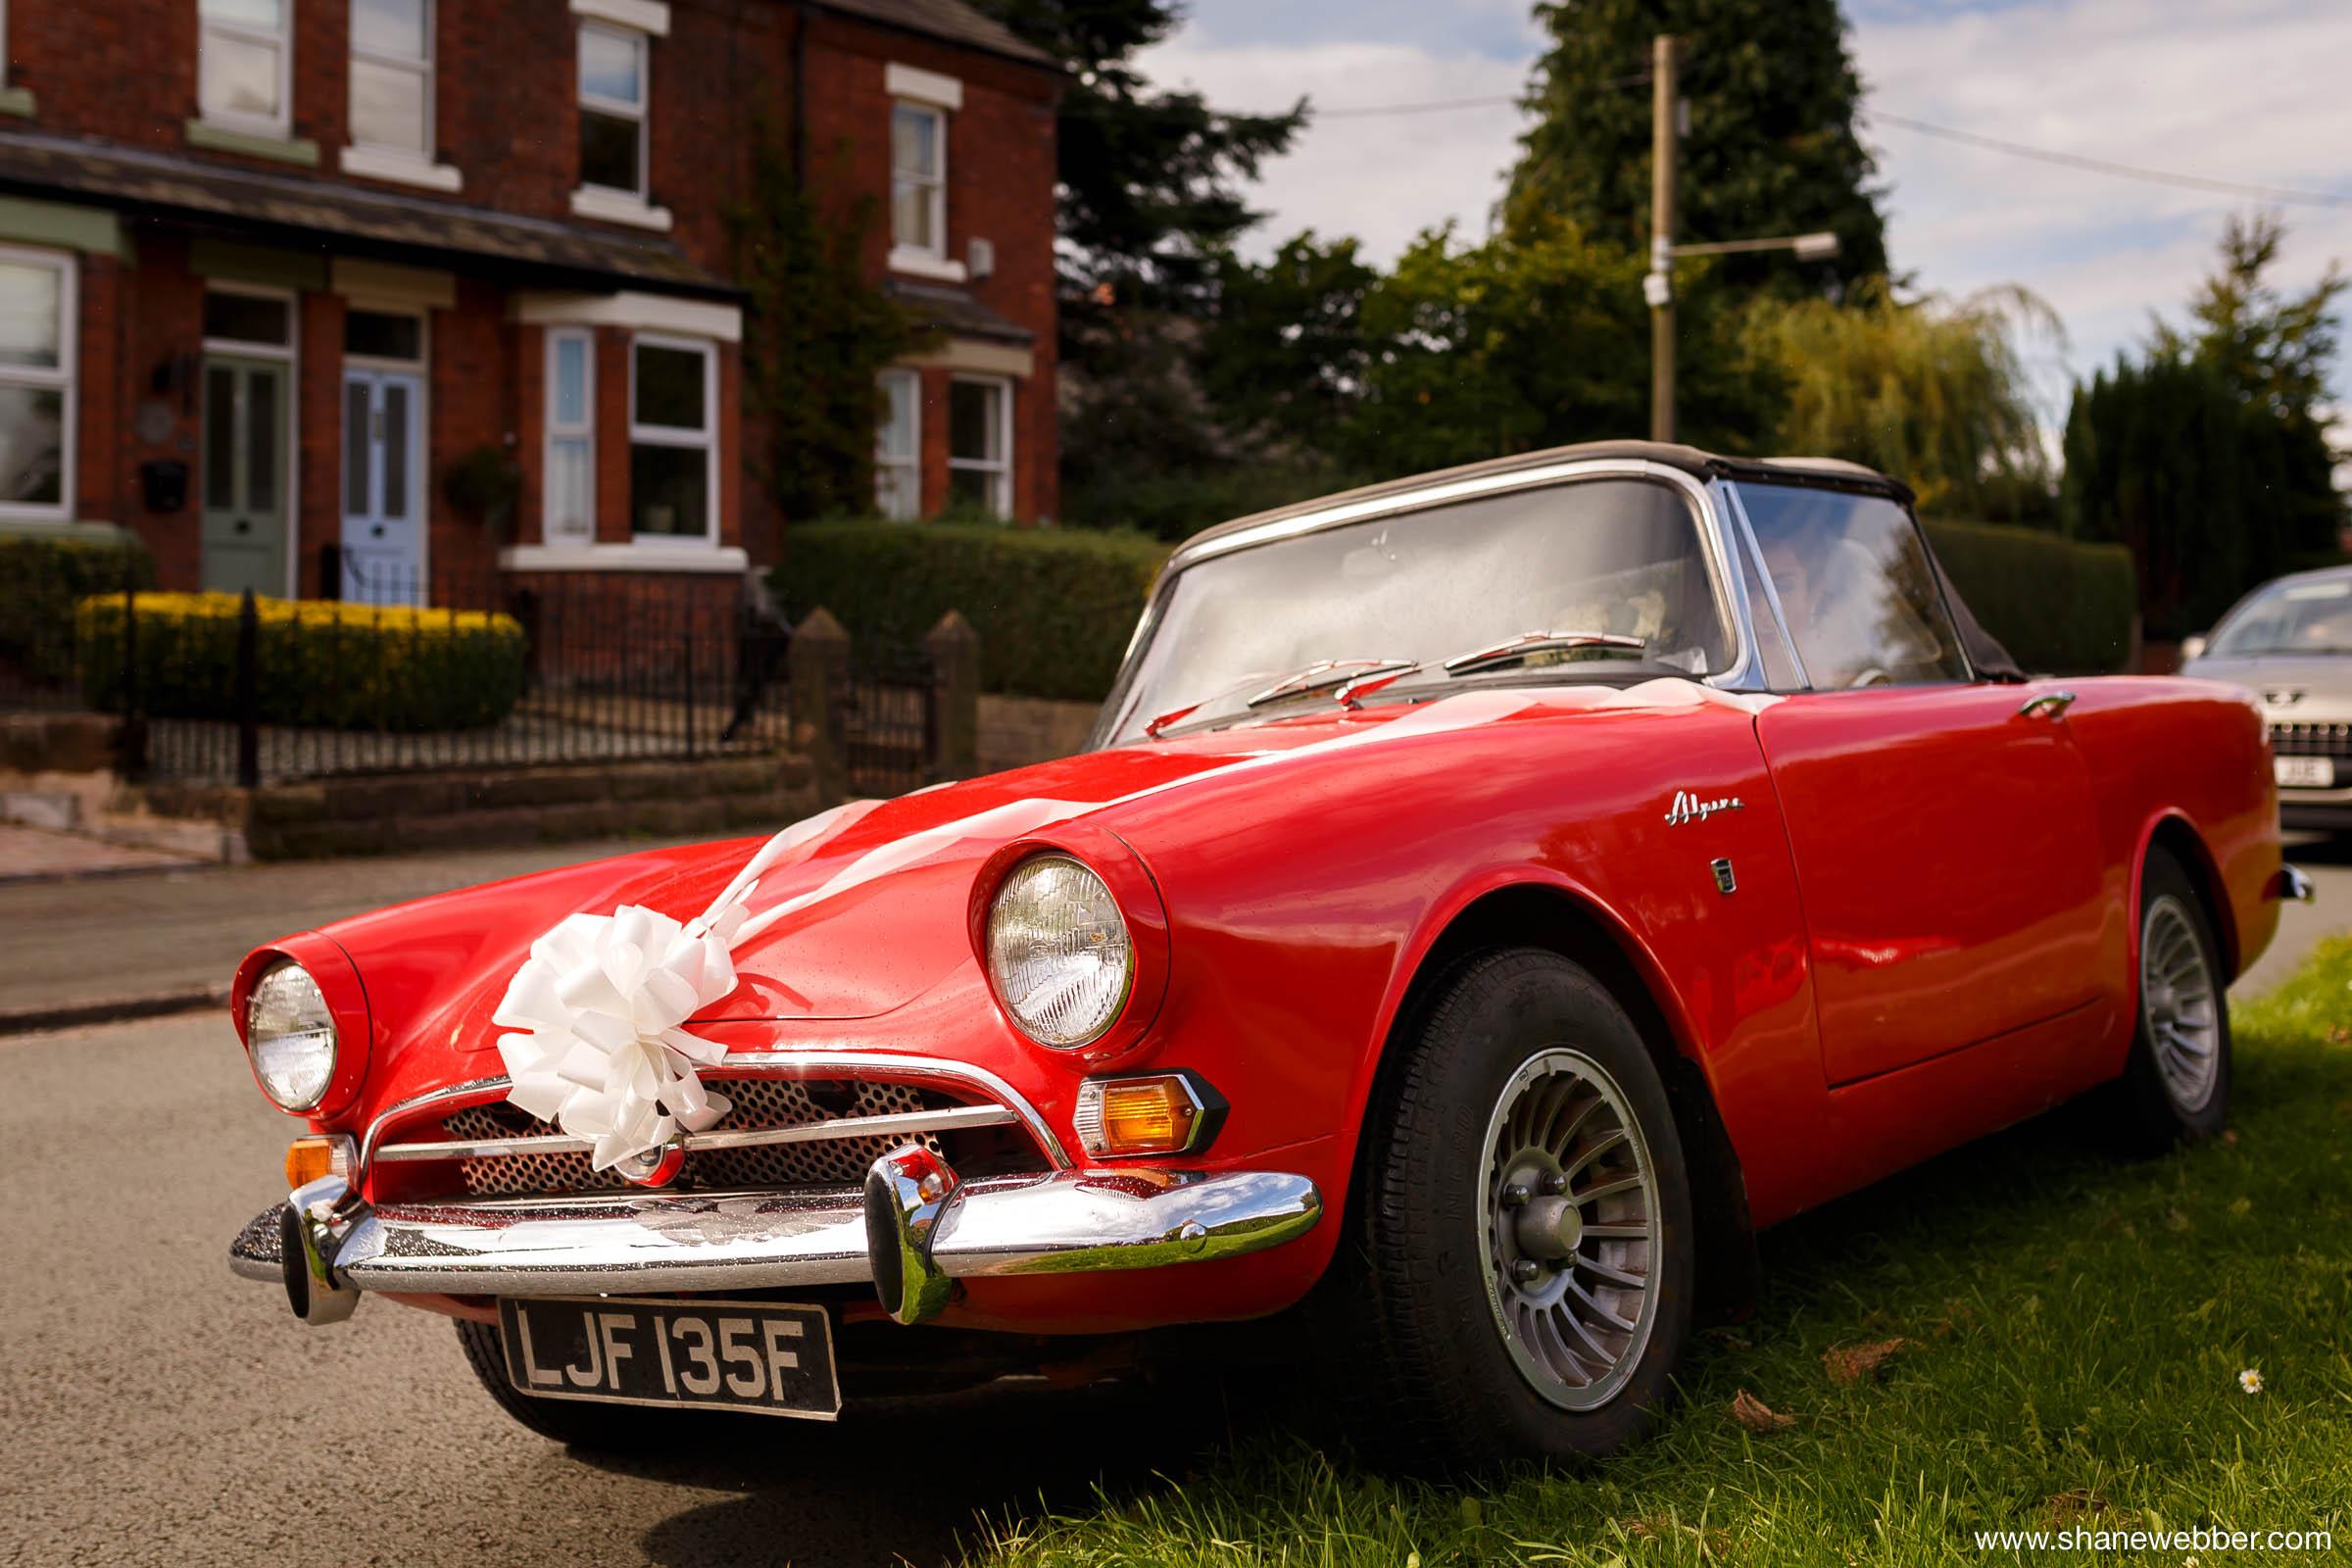 Bright red vintage wedding car